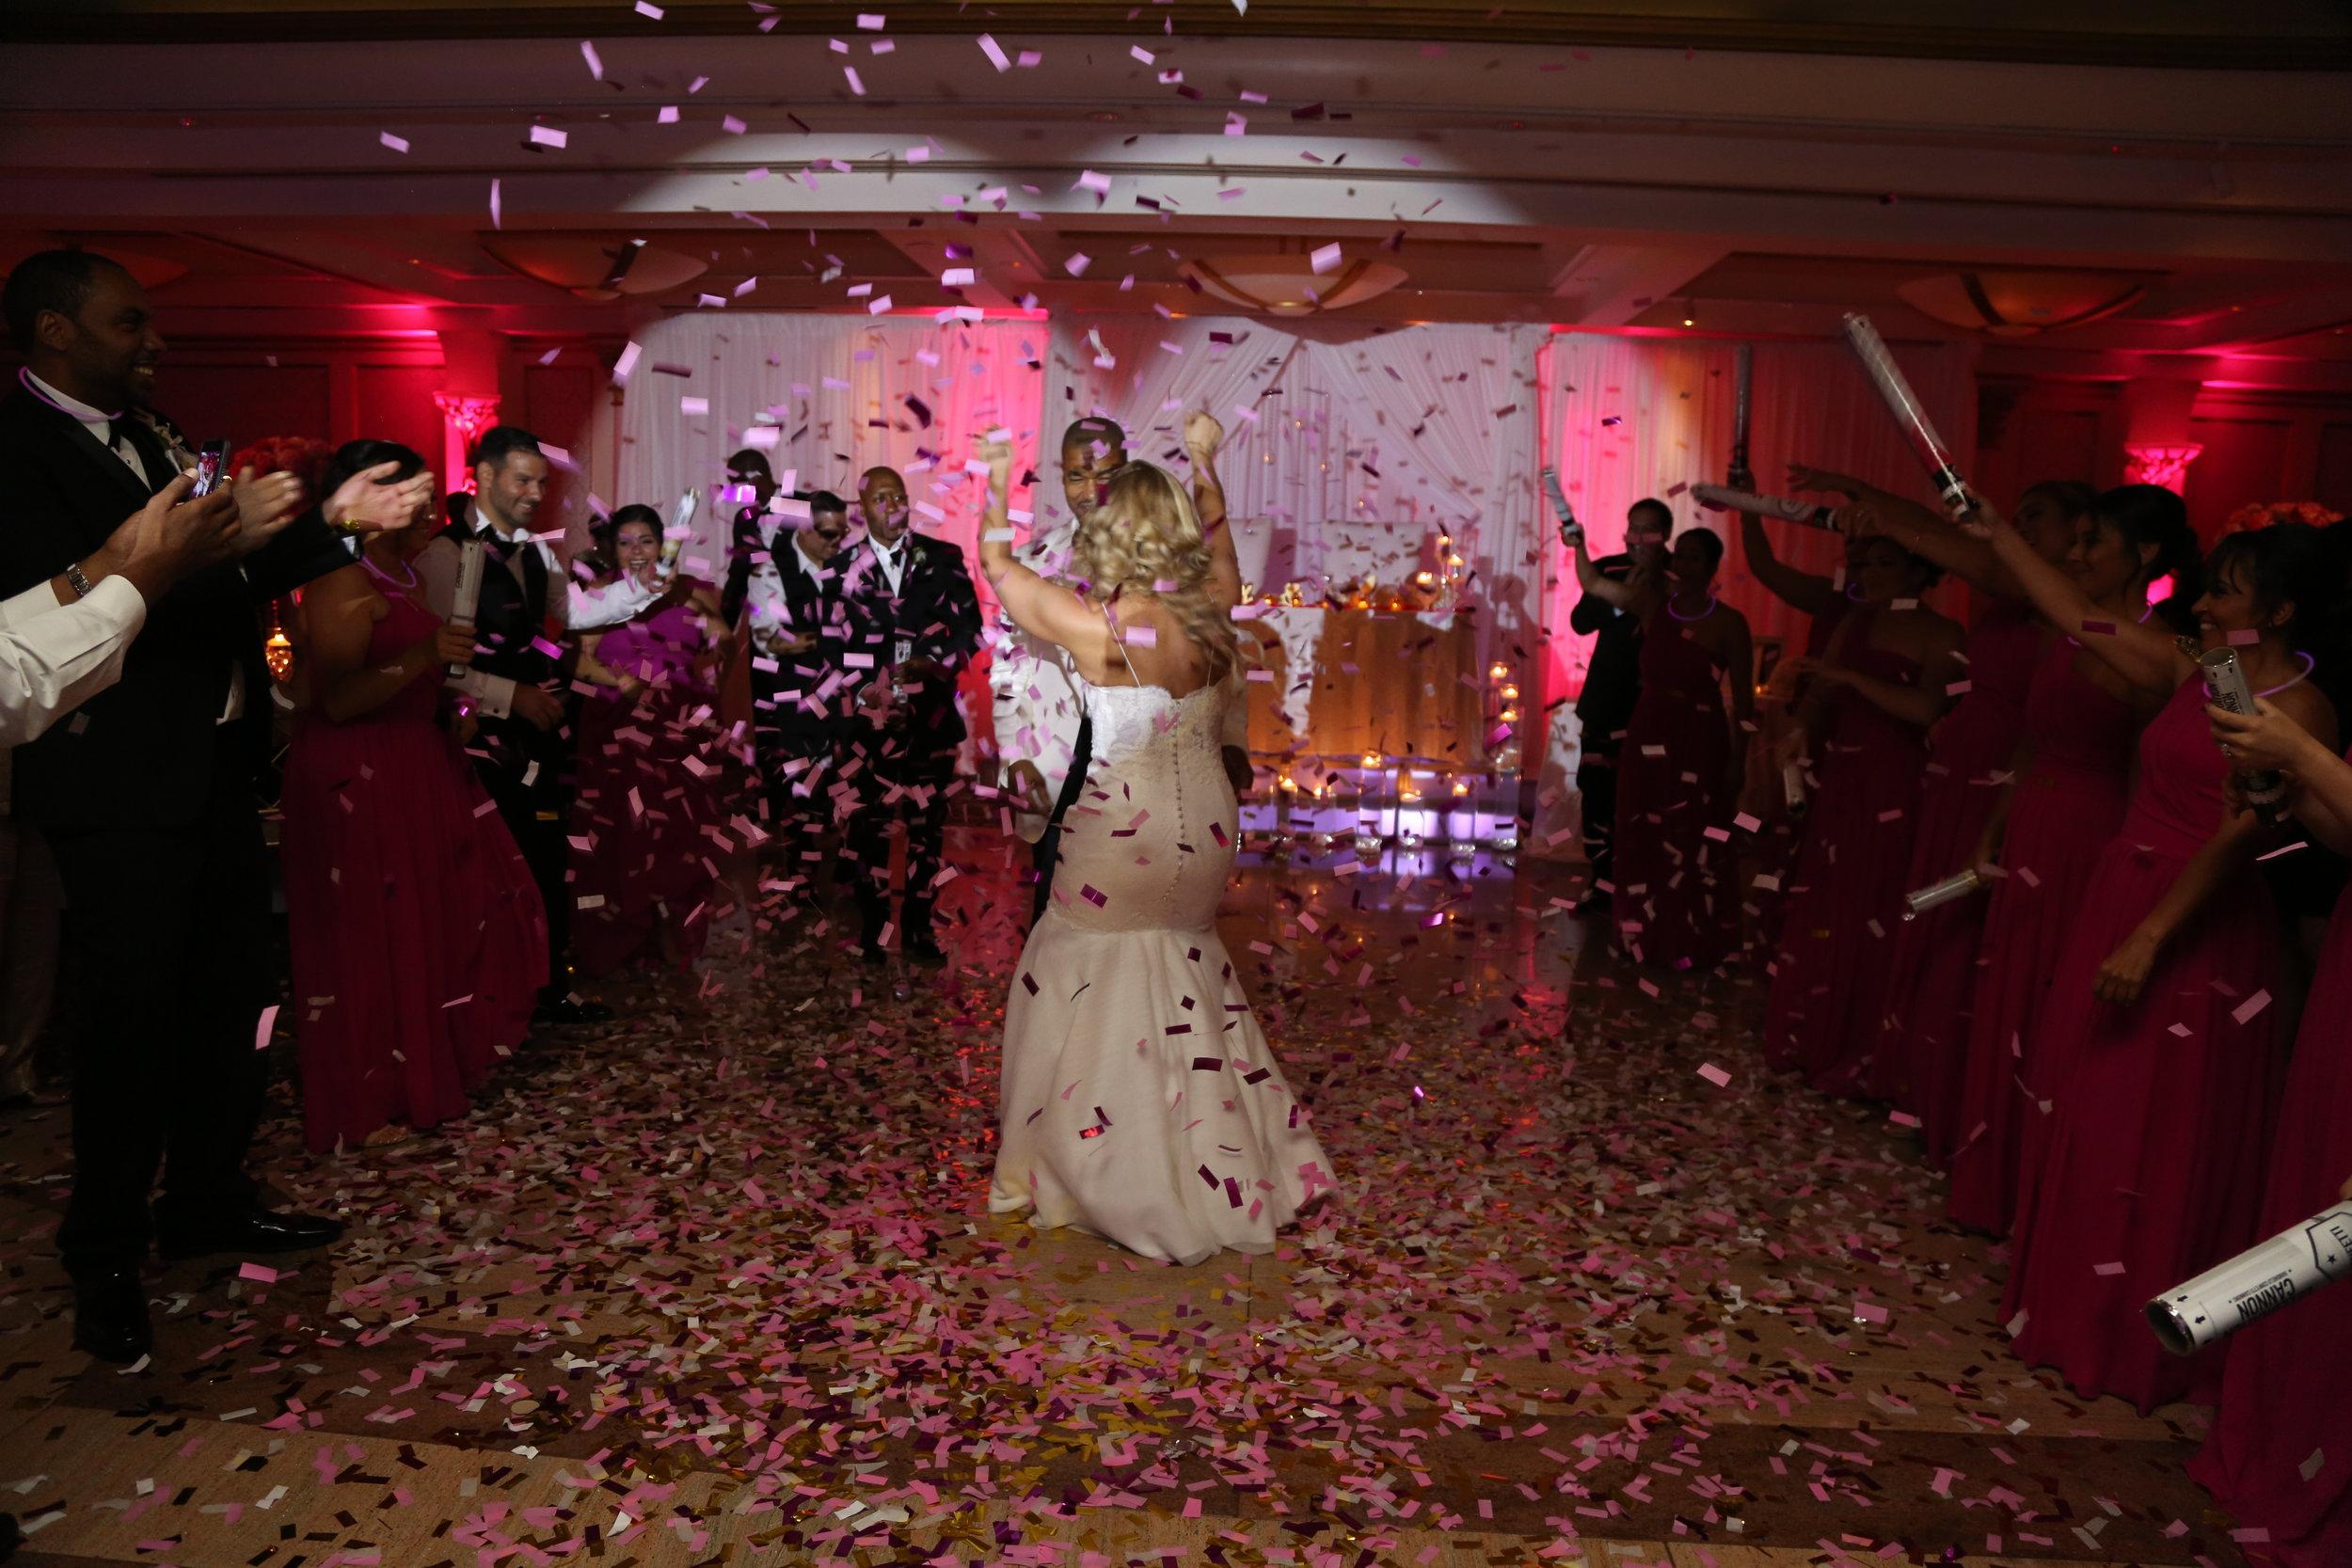 Mr. & Mrs Knox Wedding 8/19/18